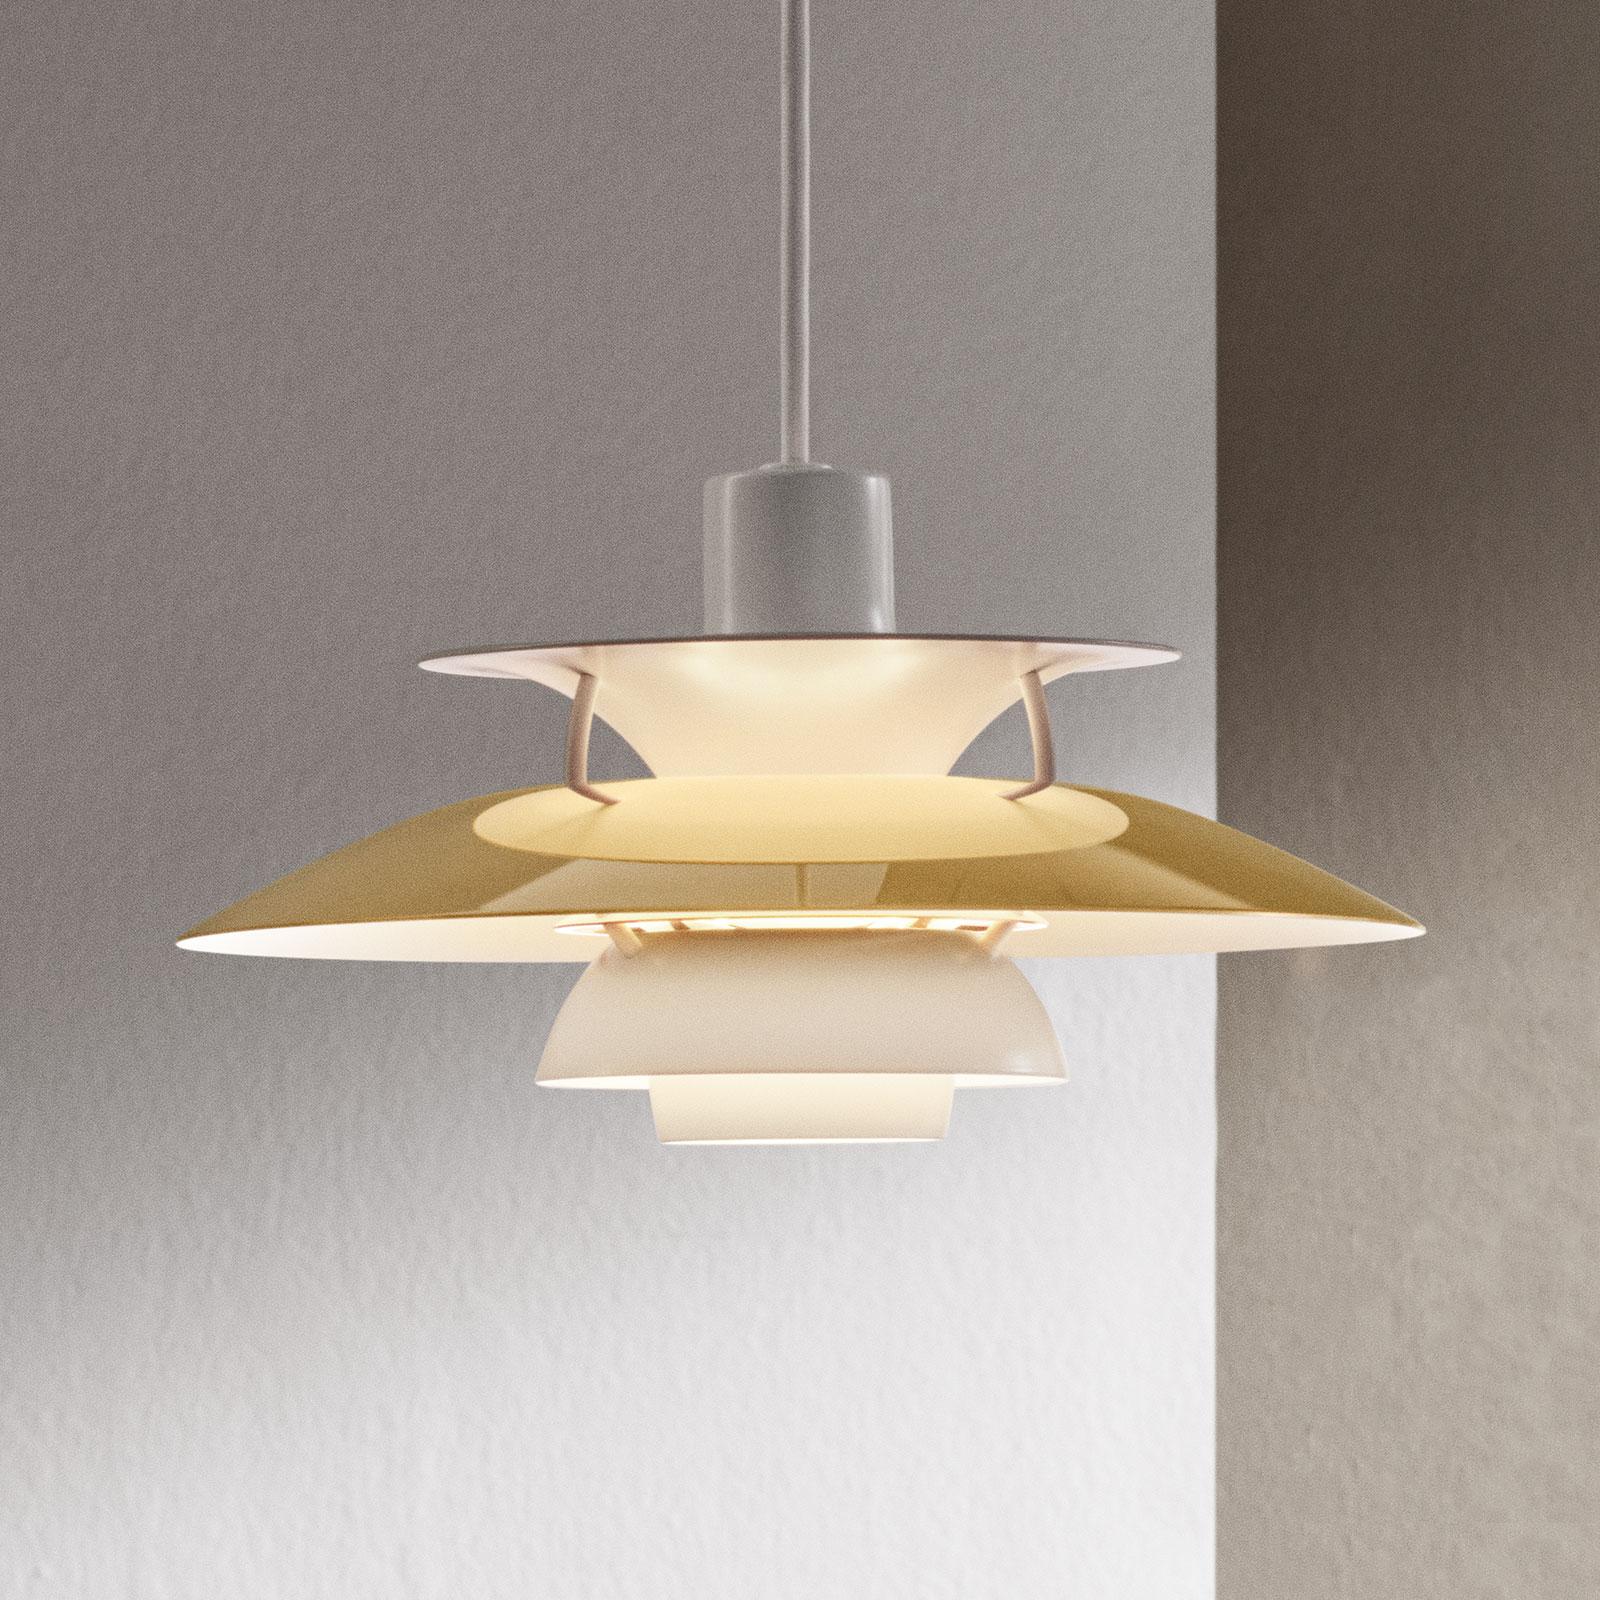 Louis Poulsen PH 5 Mini messing hanglamp Ø 30 cm